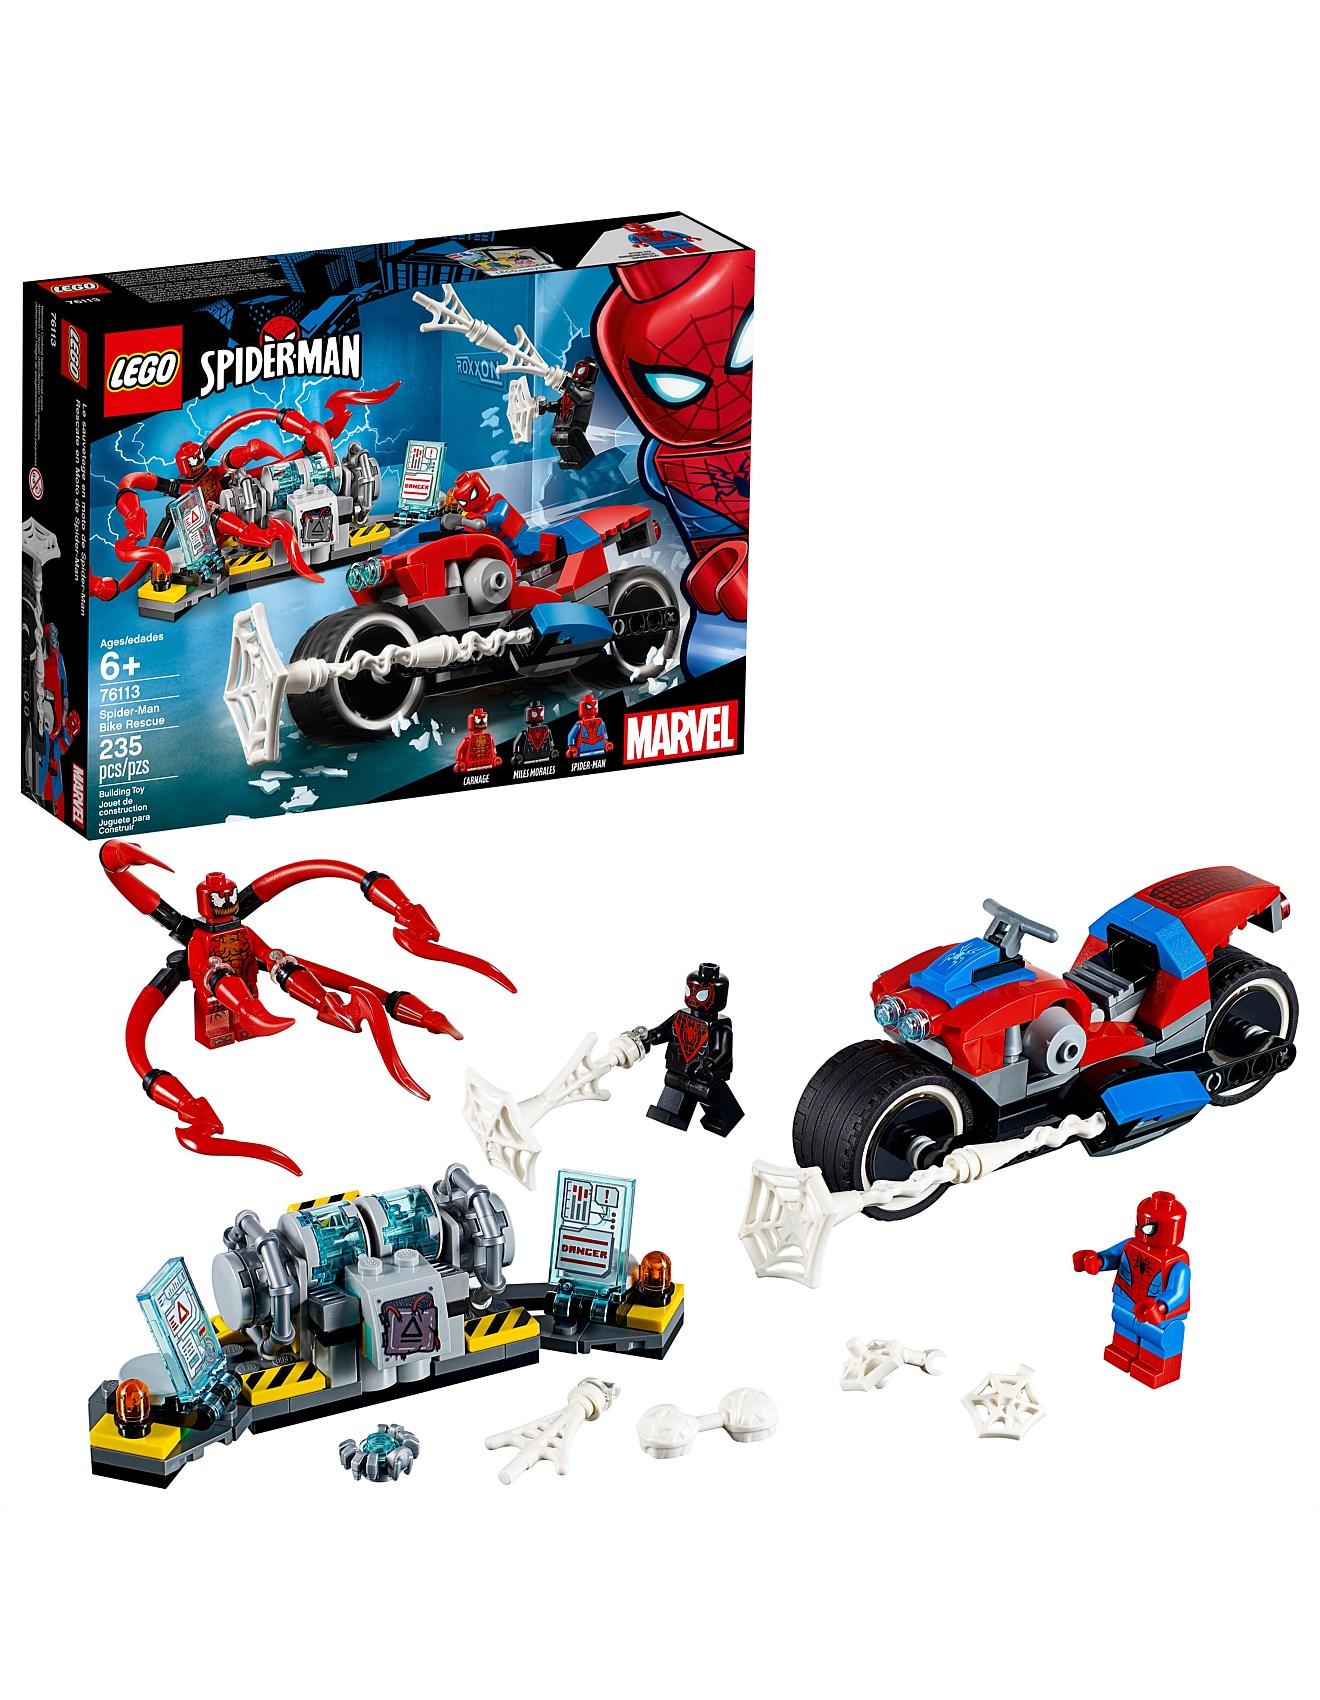 Jones Products OnlineDavid LegoBuy Lego Heroes Super fY76ybg